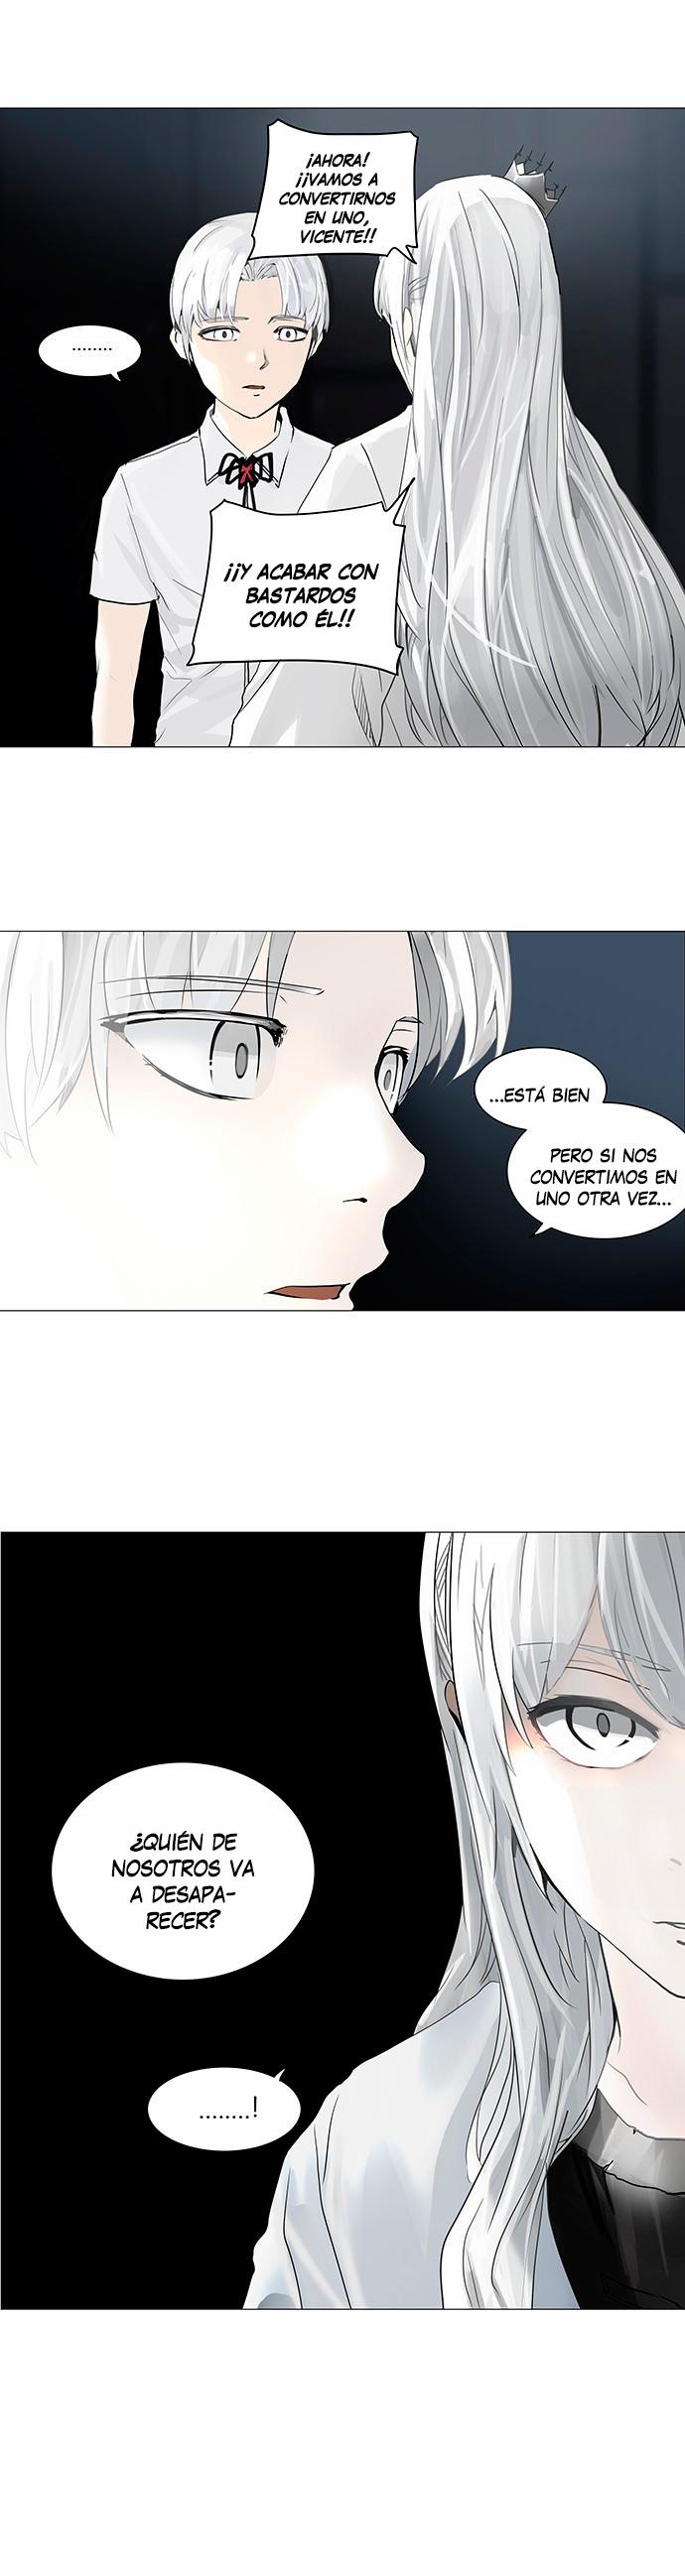 http://c5.ninemanga.com/es_manga/21/149/416884/b58d17e06531bf630e1693d502be299b.jpg Page 5